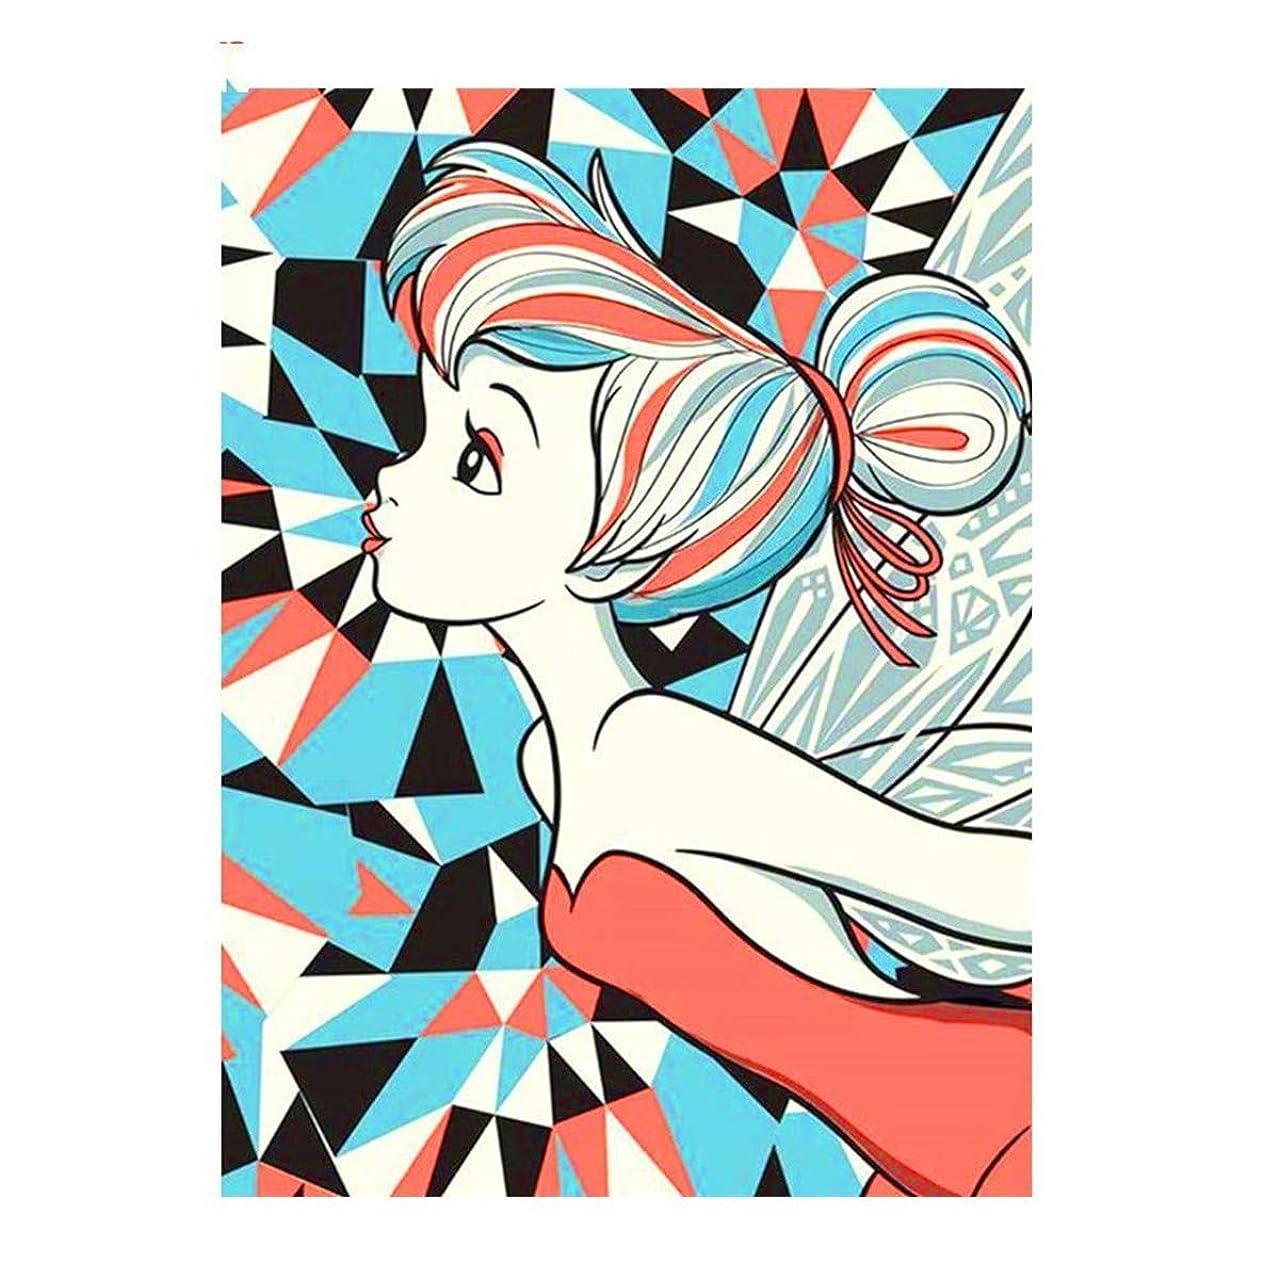 5D Diamond Painting Kits Full Drill Diamond Embroidery (Girl, 12x16)